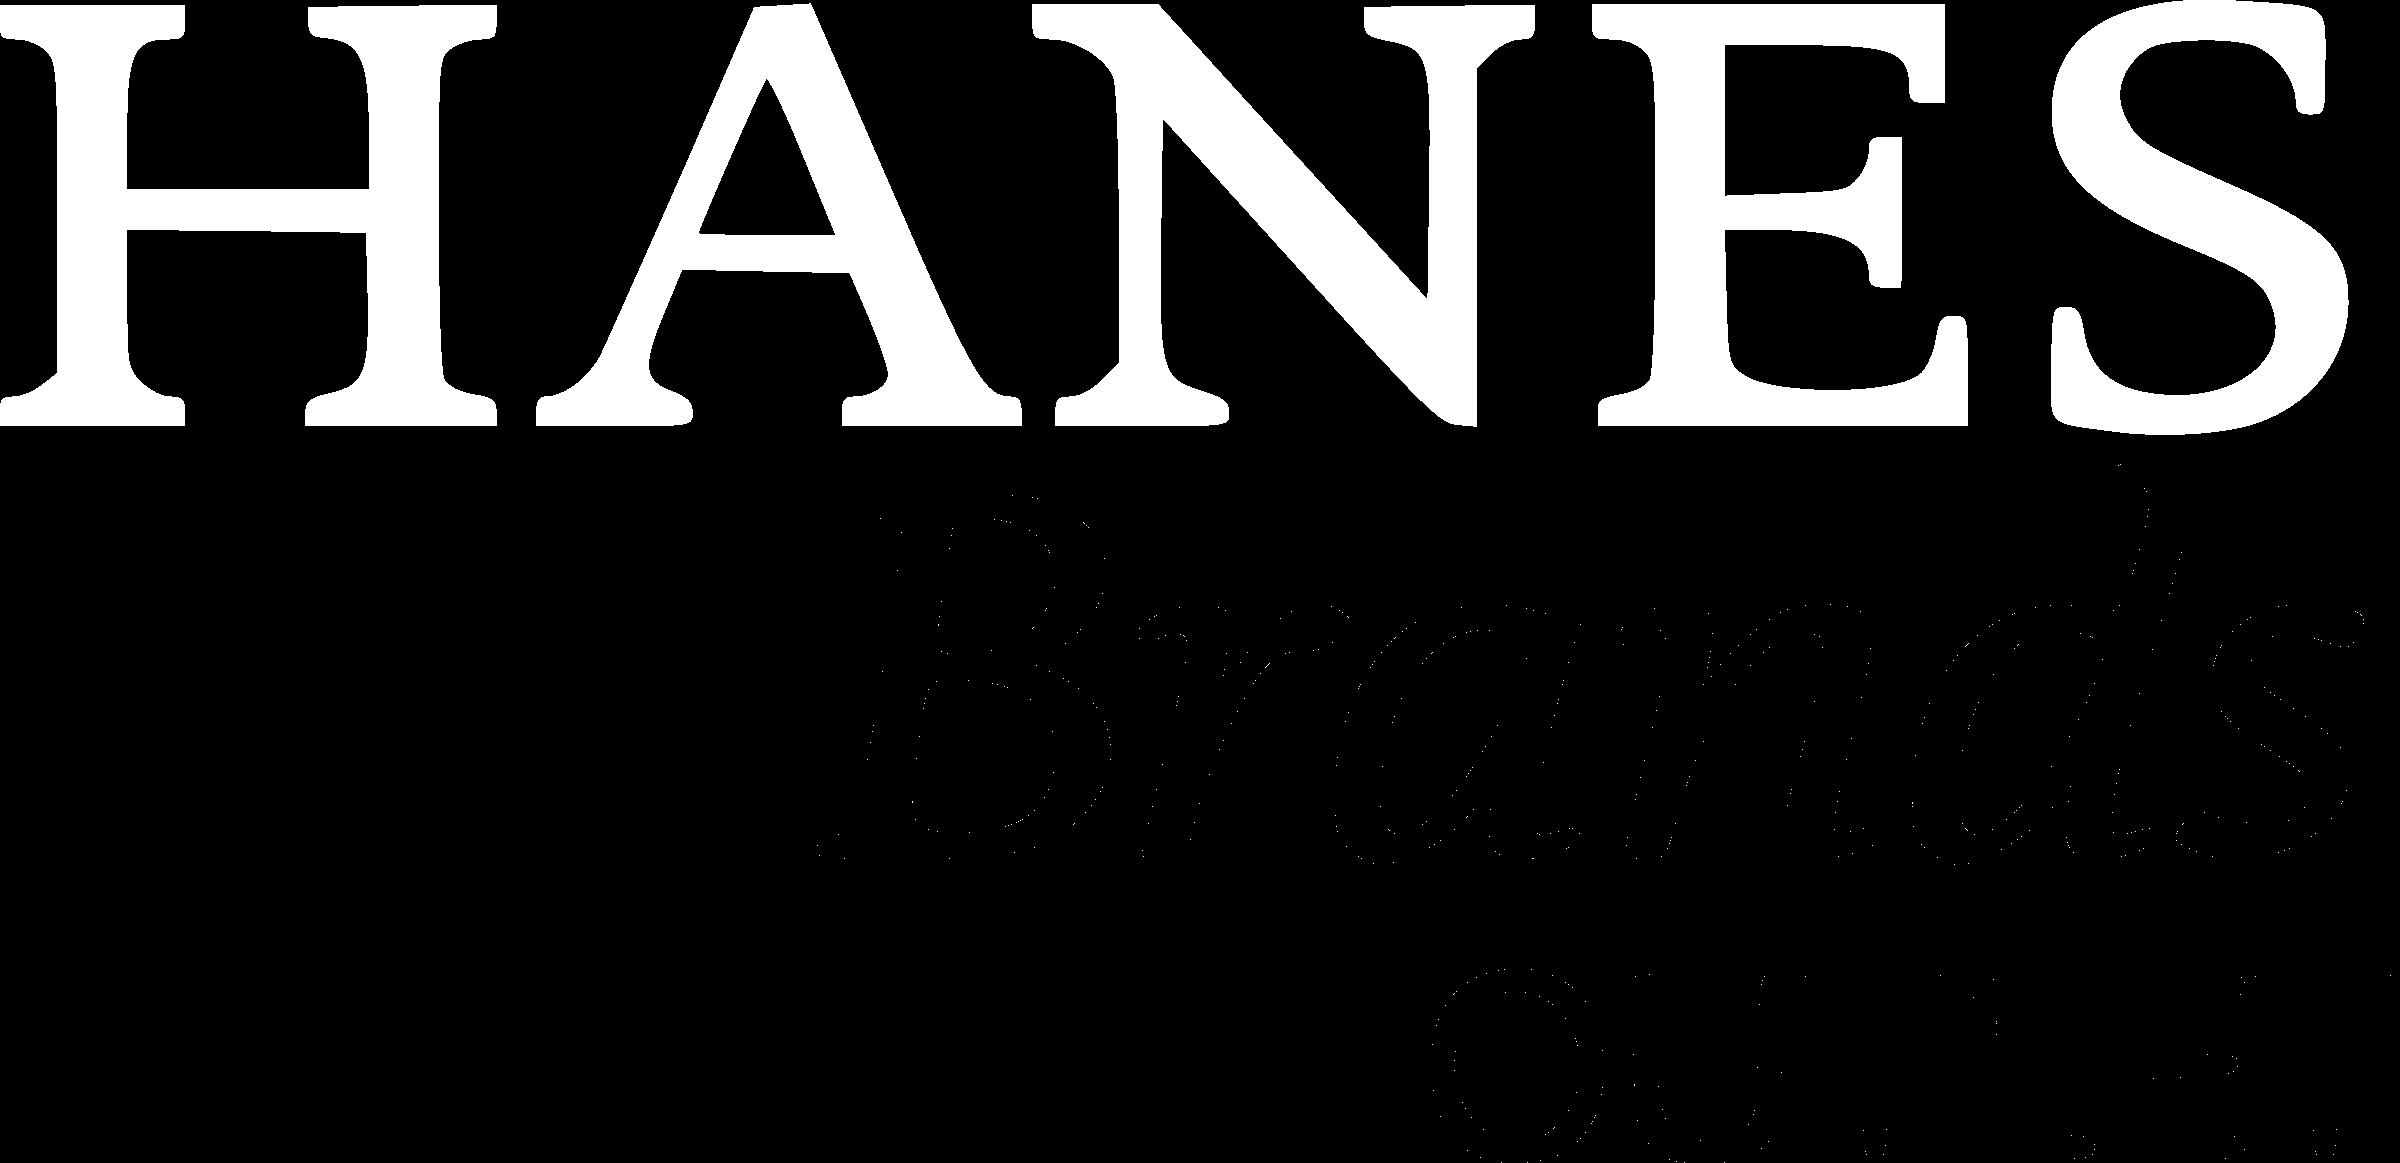 6ad6f6d47e7cb HanesBrands Outlet Logo PNG Transparent   SVG Vector - Freebie Supply